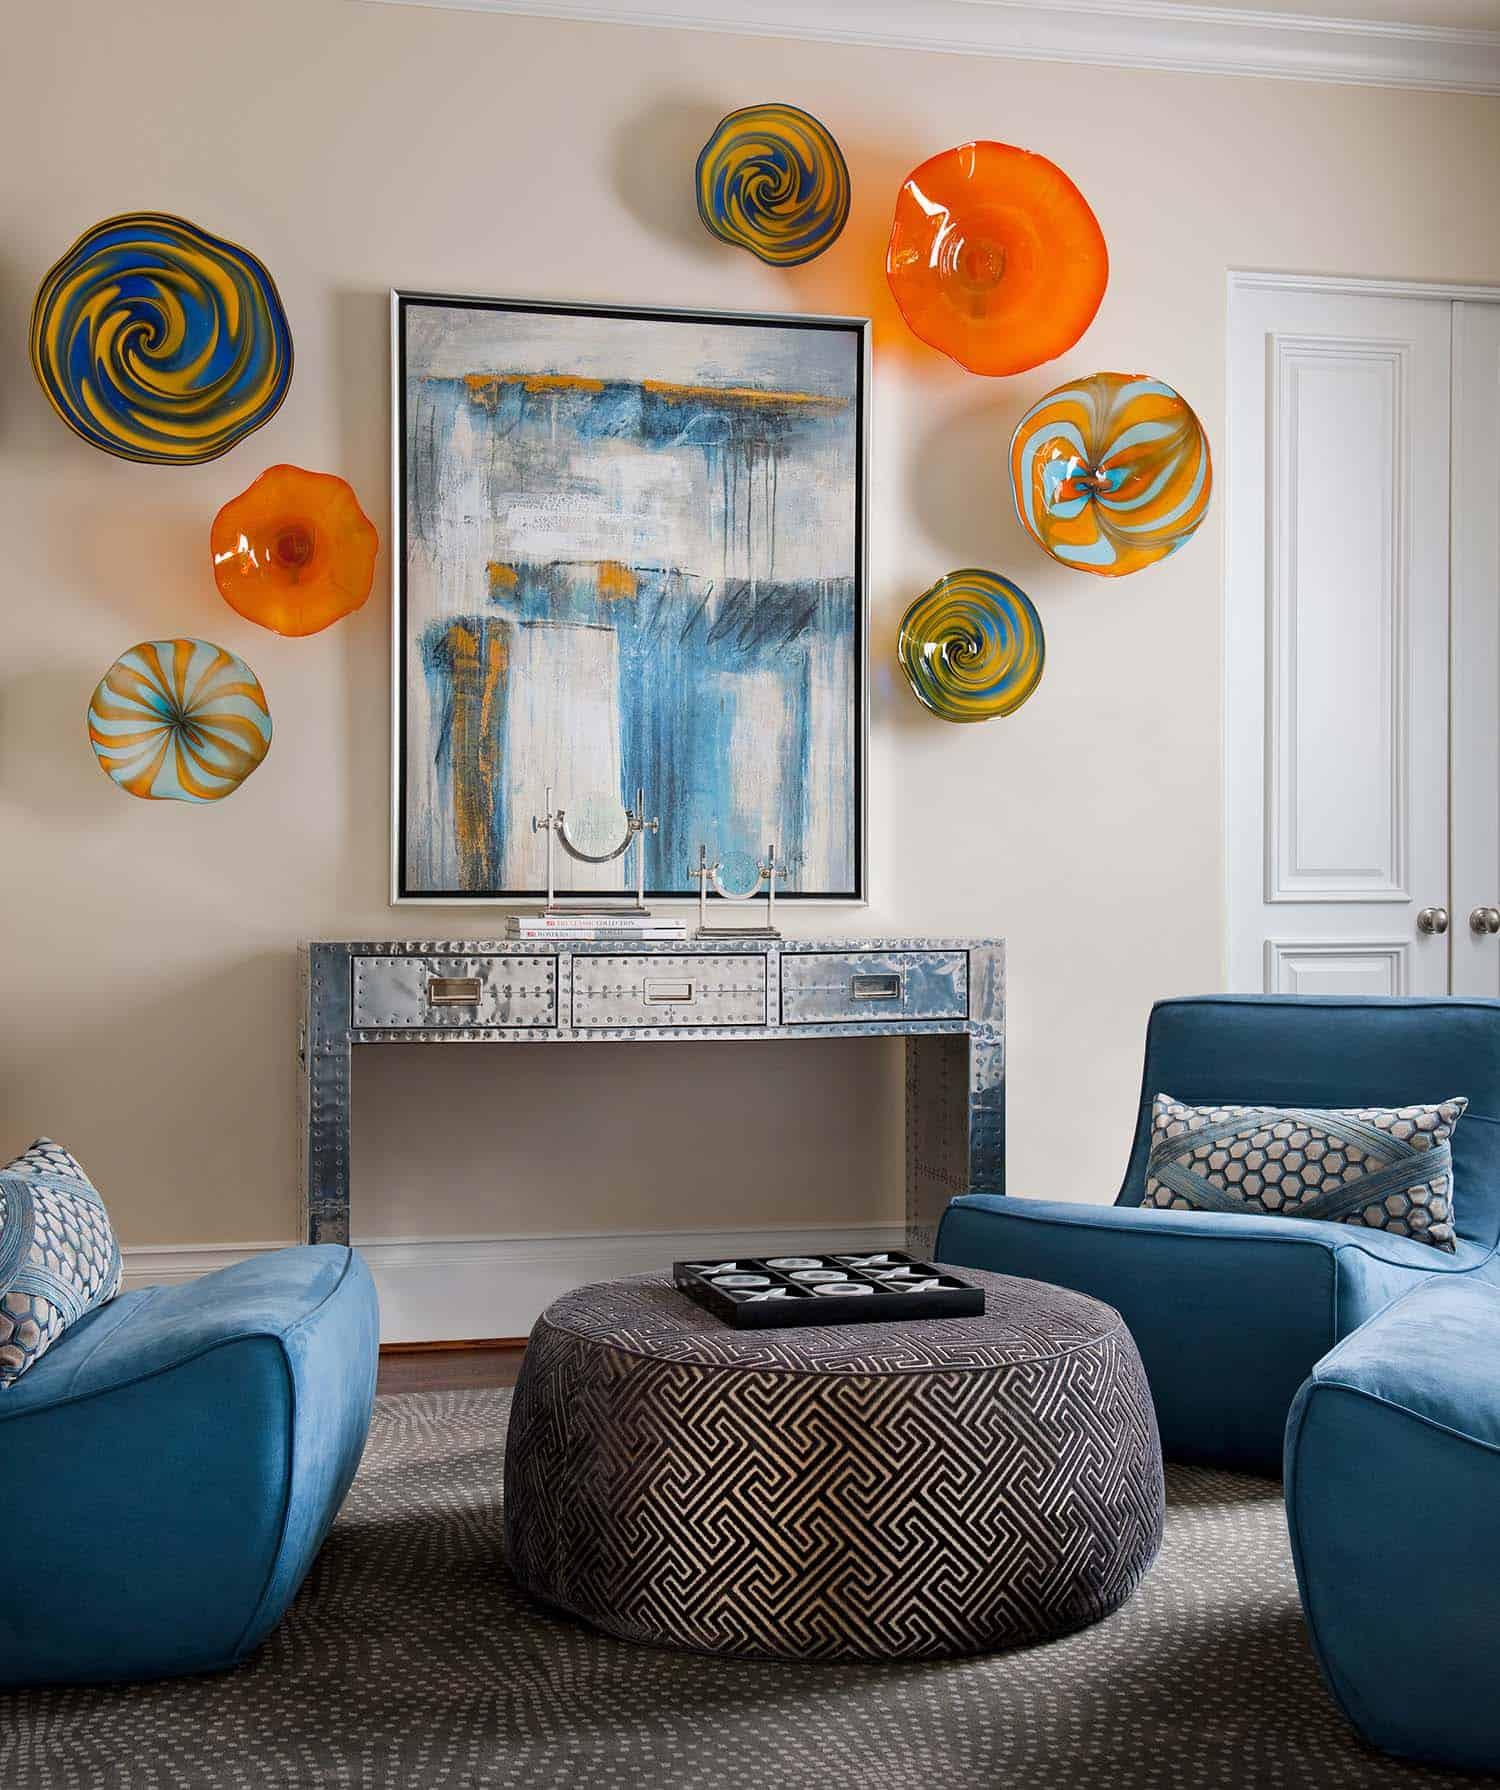 Contemporary Style Home-Dallas Design Group-23-1 Kindesign